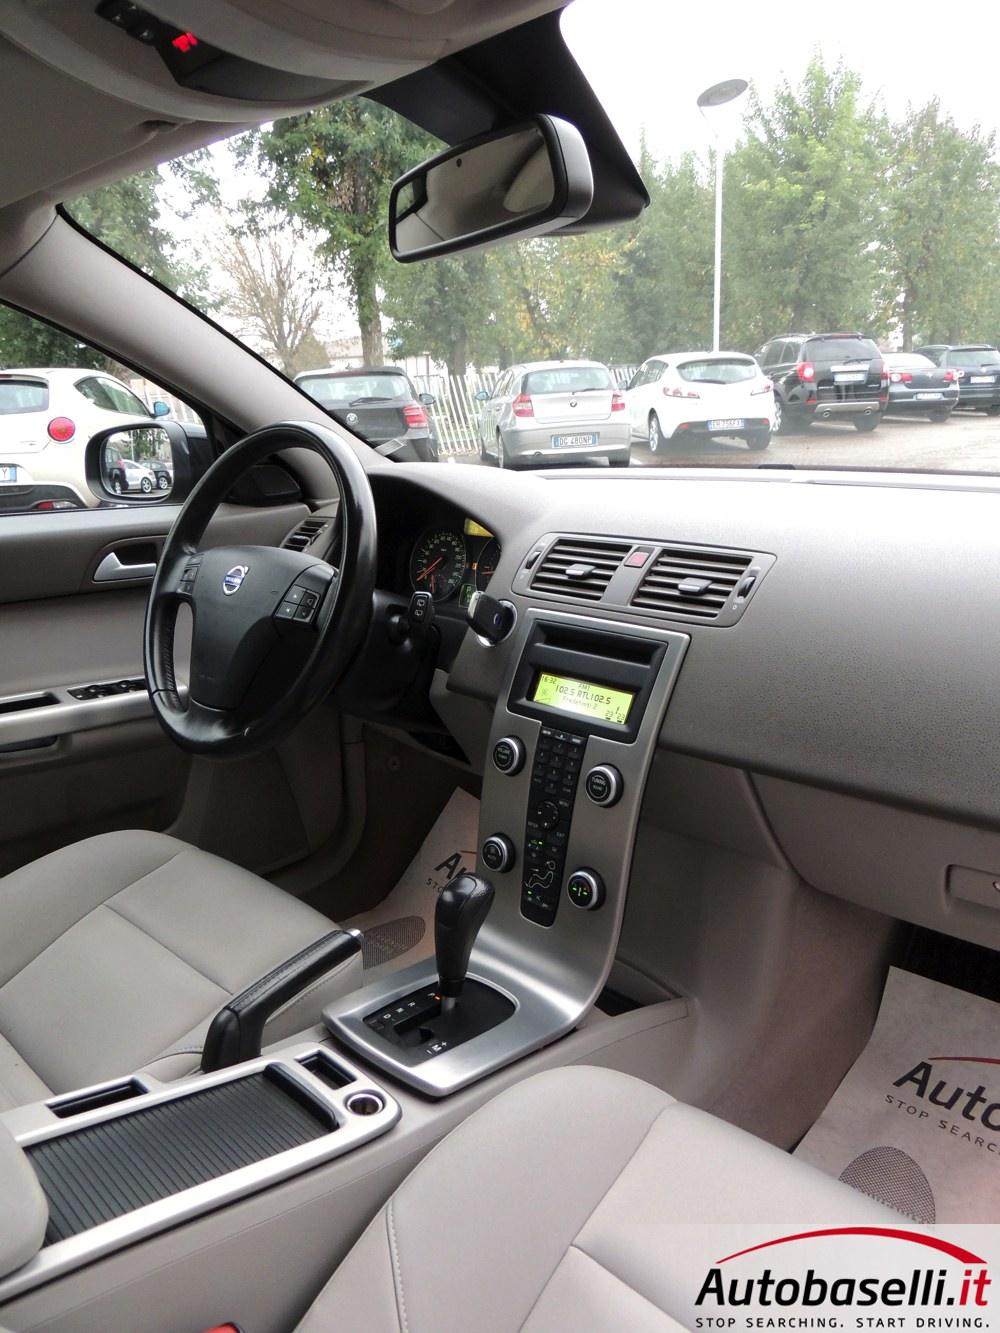 Volvo V50 2 4 D5 Momentum Geartronic 180 Cv Cambio